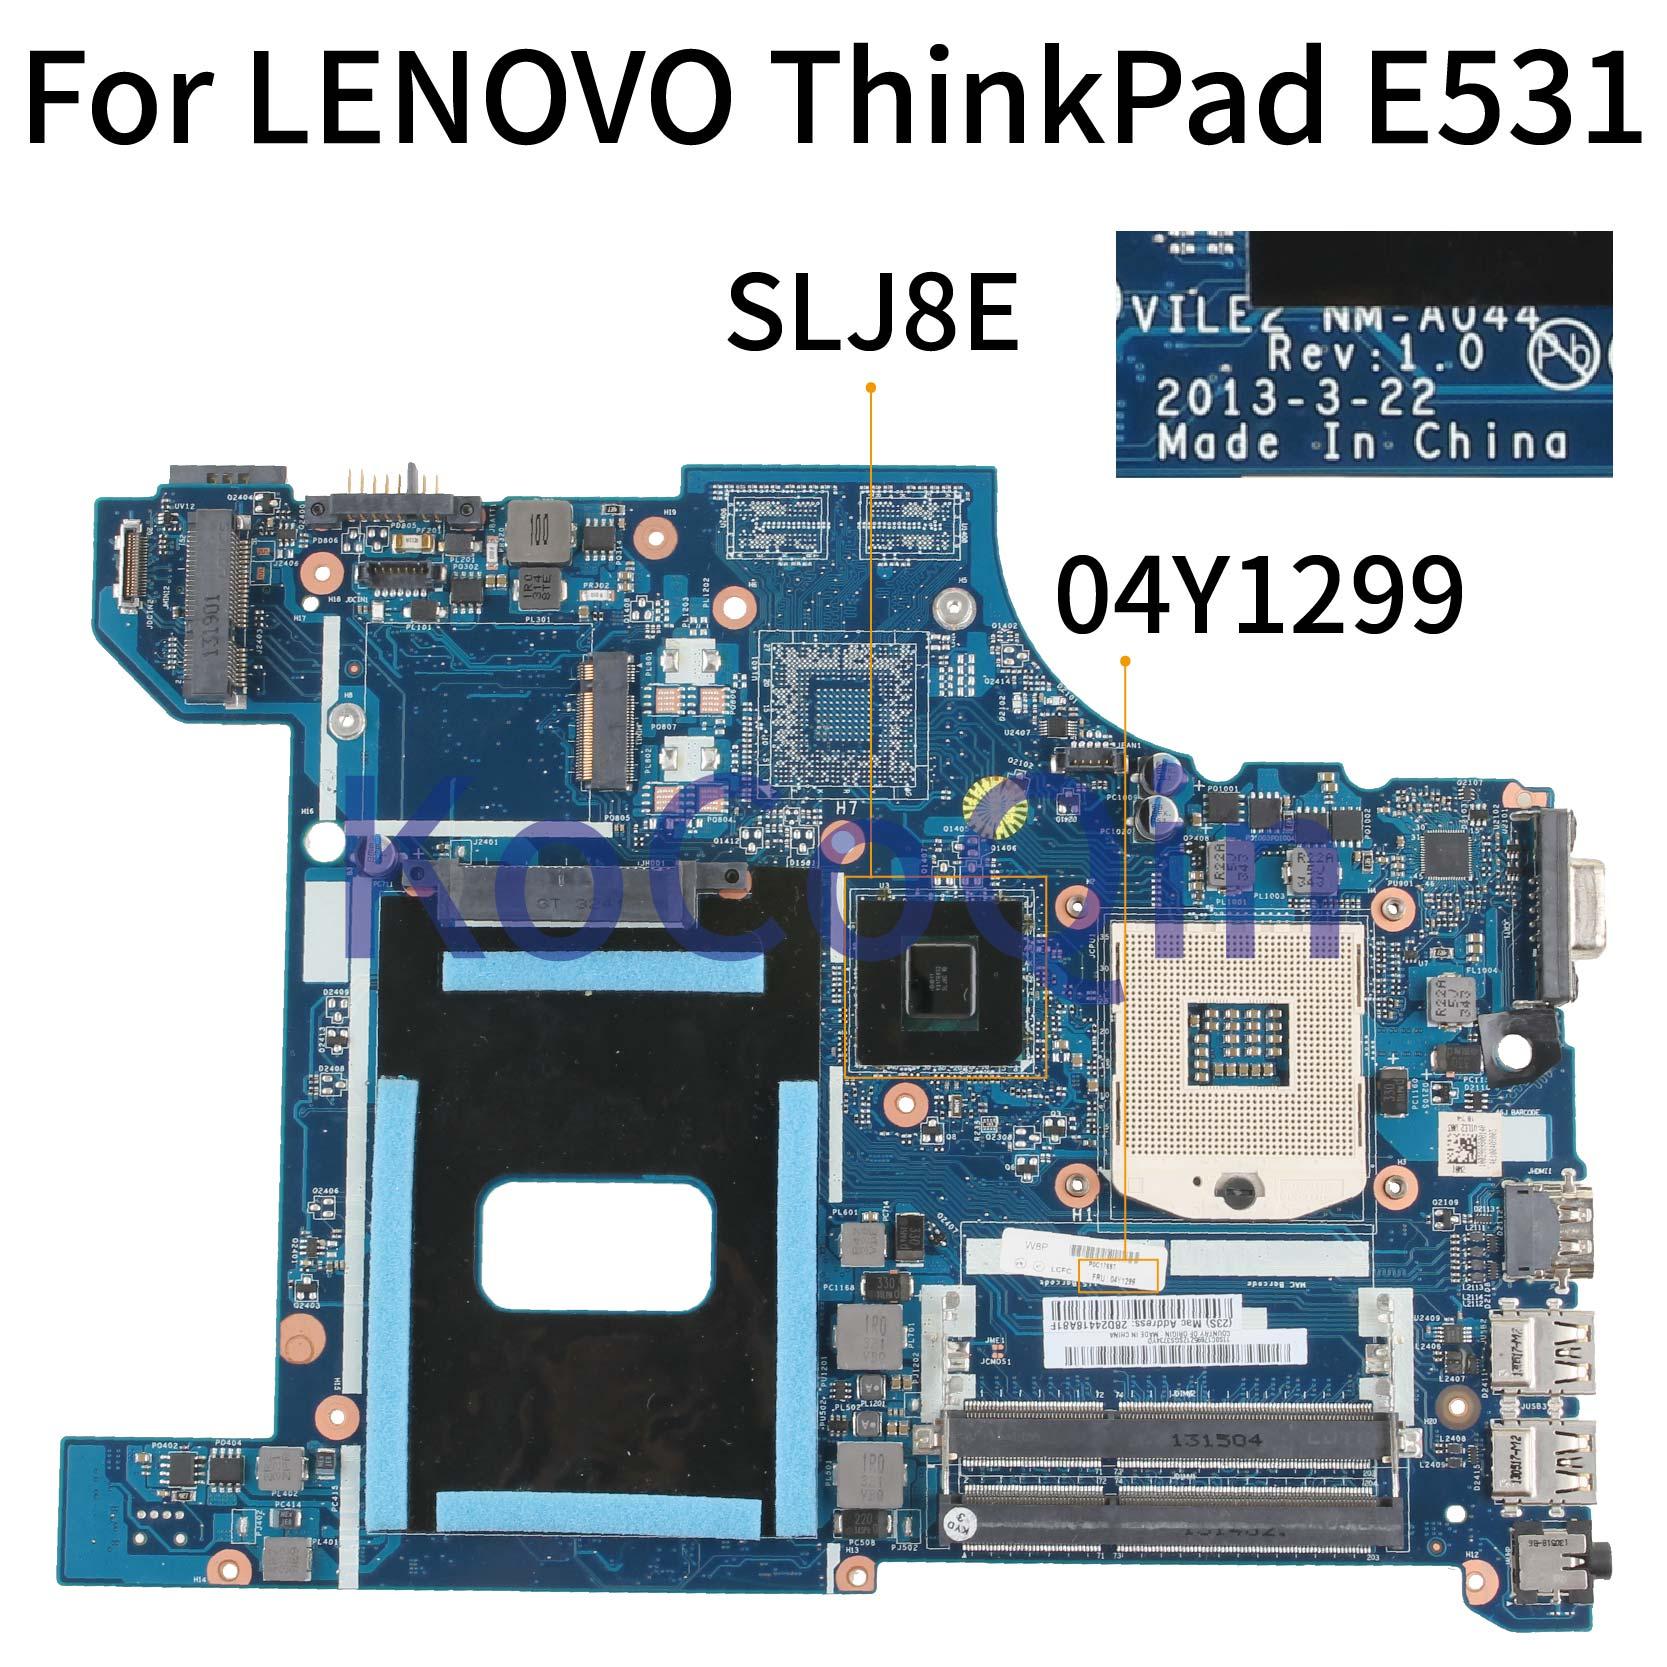 KoCoQin Laptop Motherboard For LENOVO ThinkPad EDGE E531 HM77 Mainboard 04Y1299 VILE2 NM-A044 SLJ8E